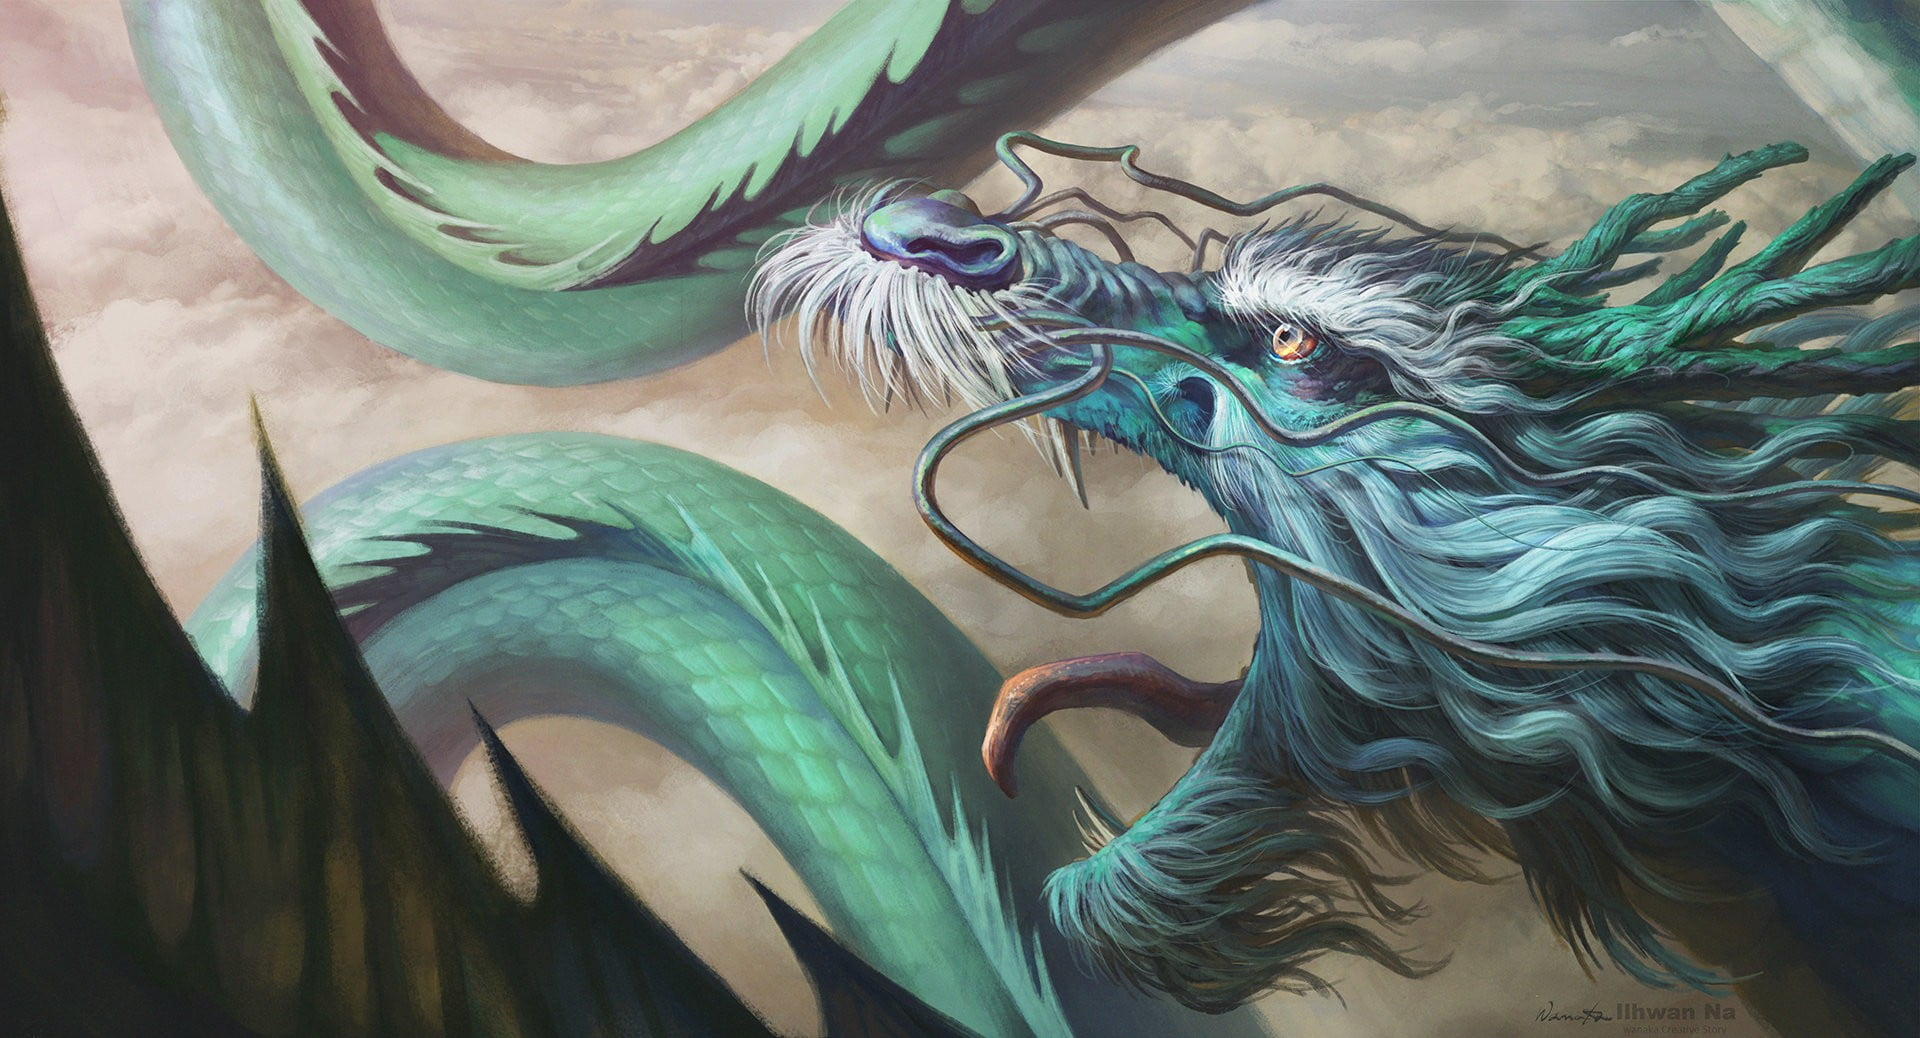 Chinese Dragon Fantasy Art - HD Wallpaper